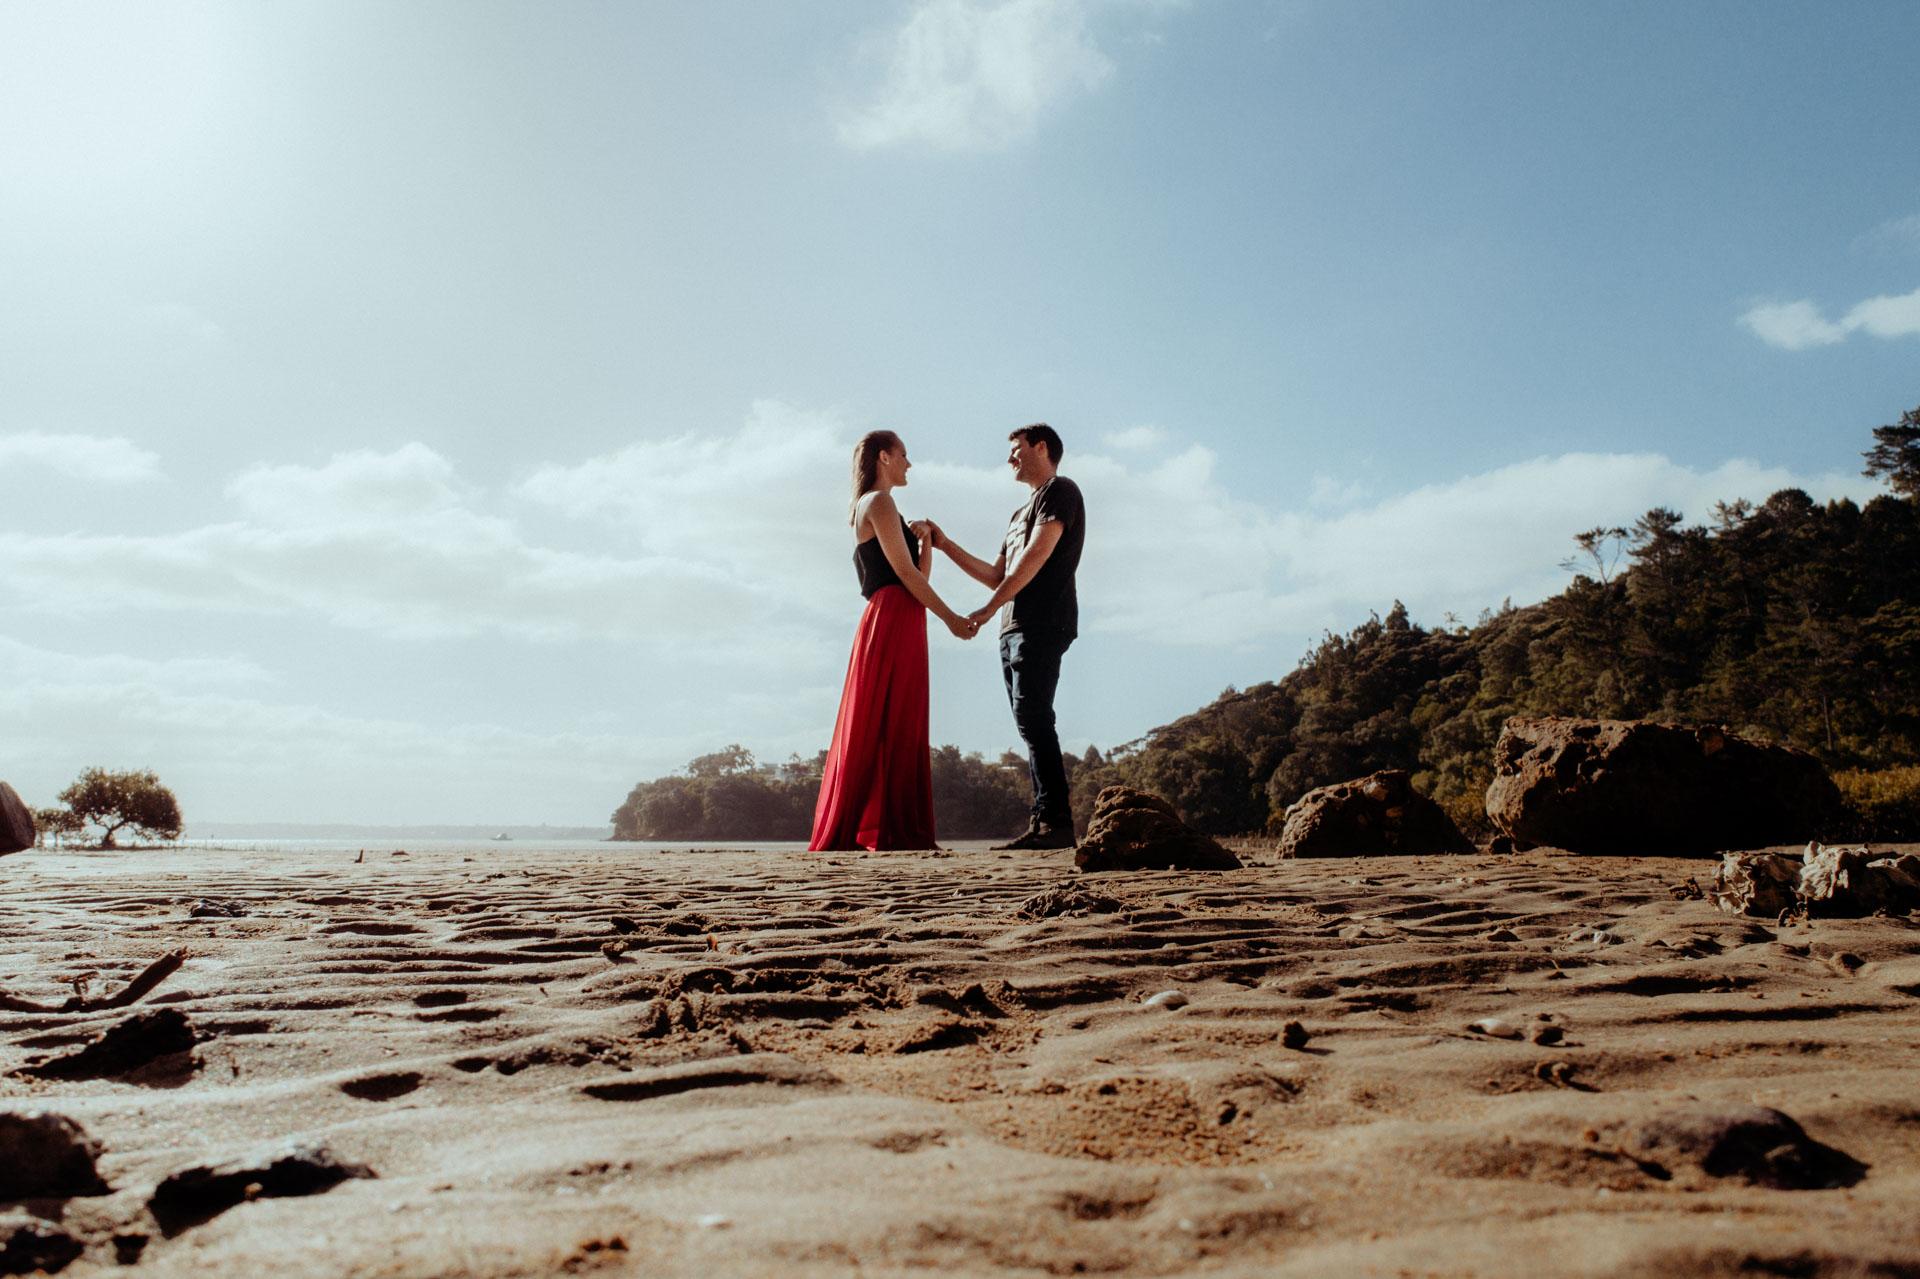 Courtney & James Engagement Shoot - Kauri Bay Domain, Auckland